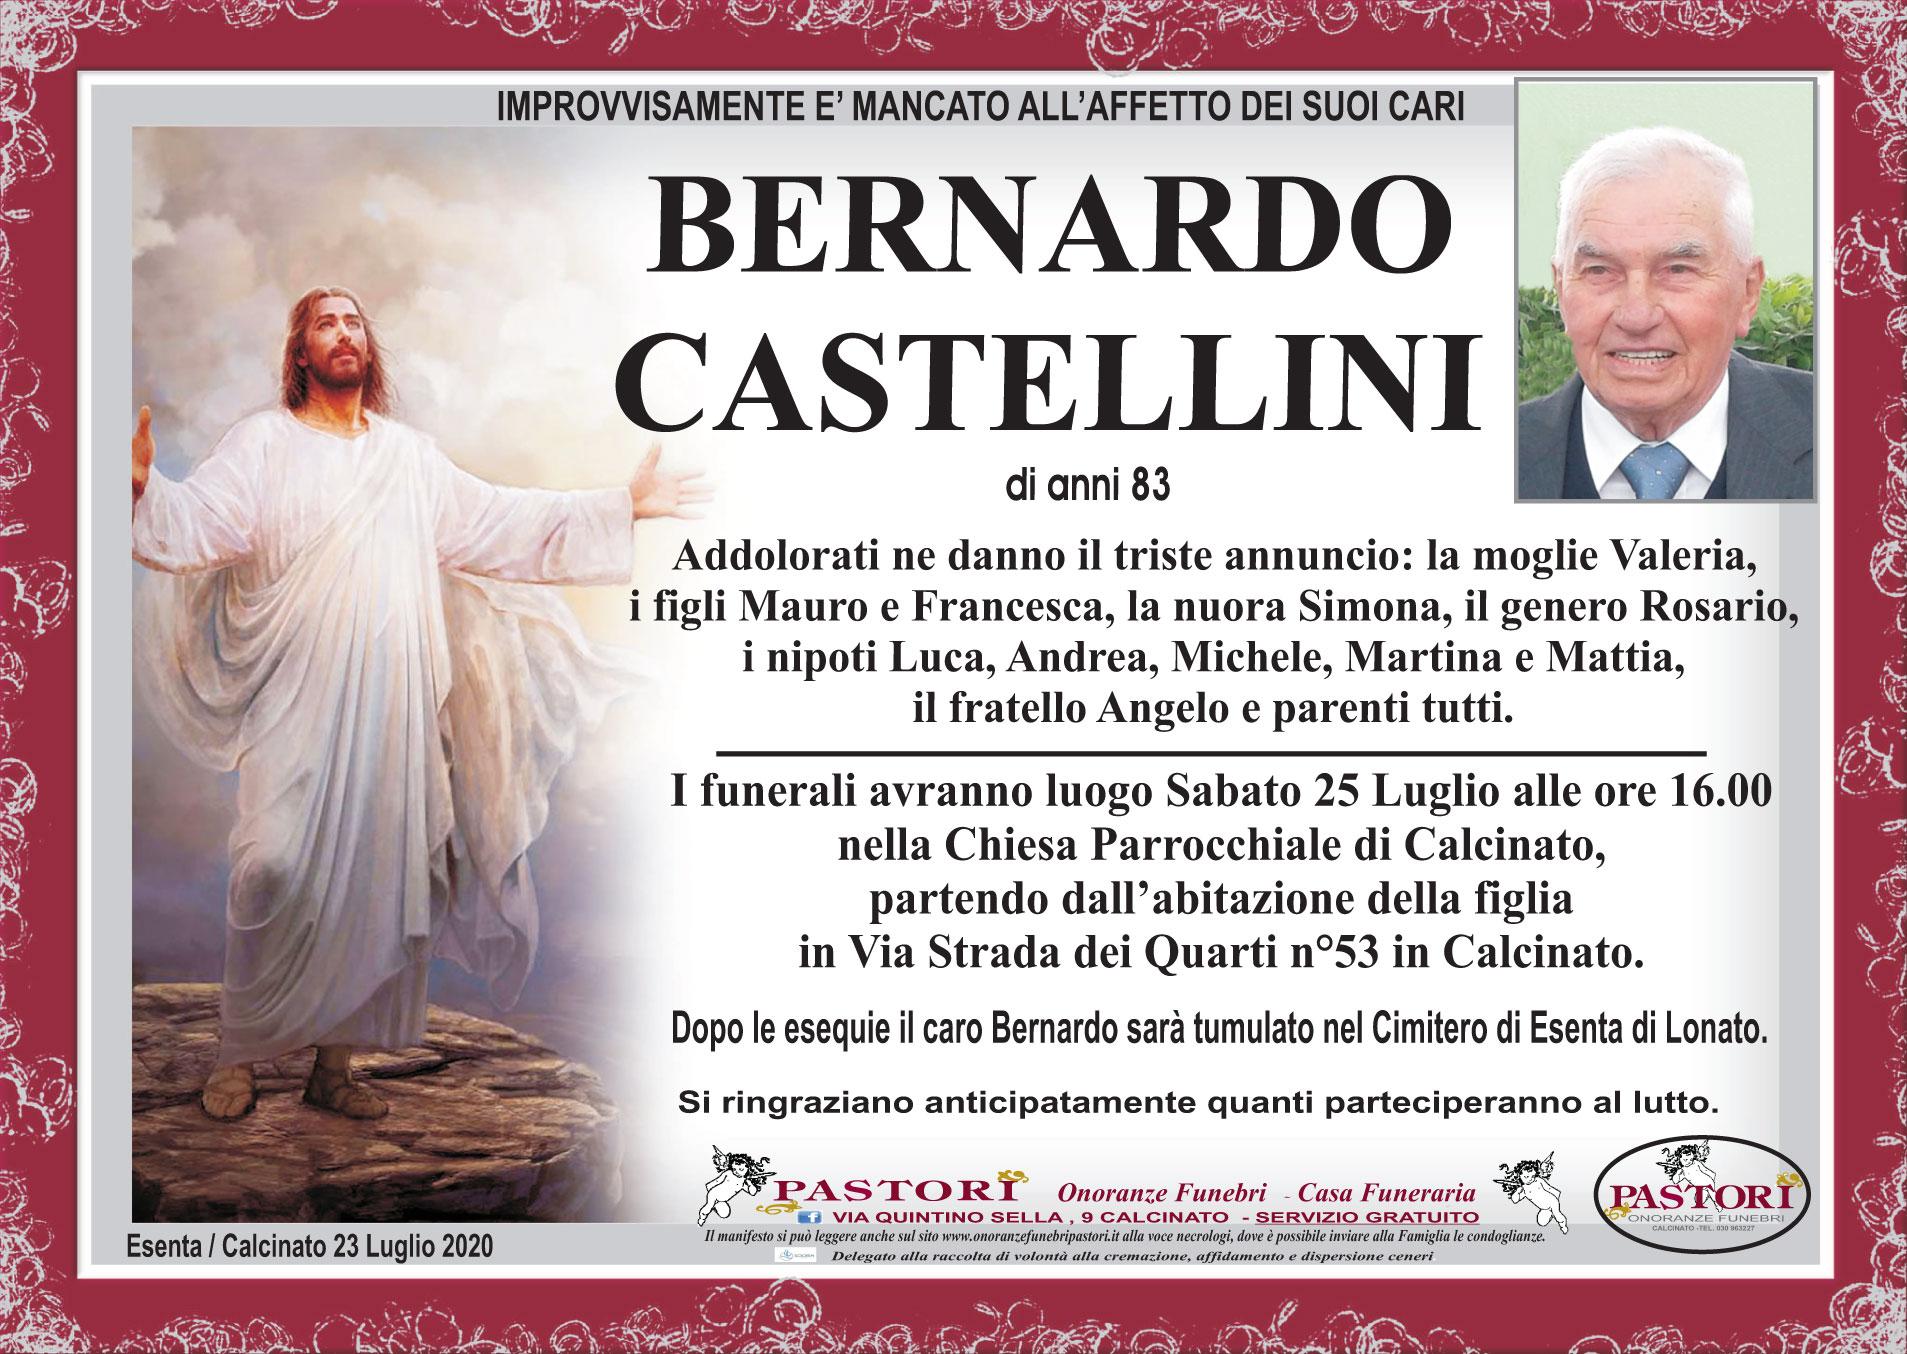 Bernardo Castellini